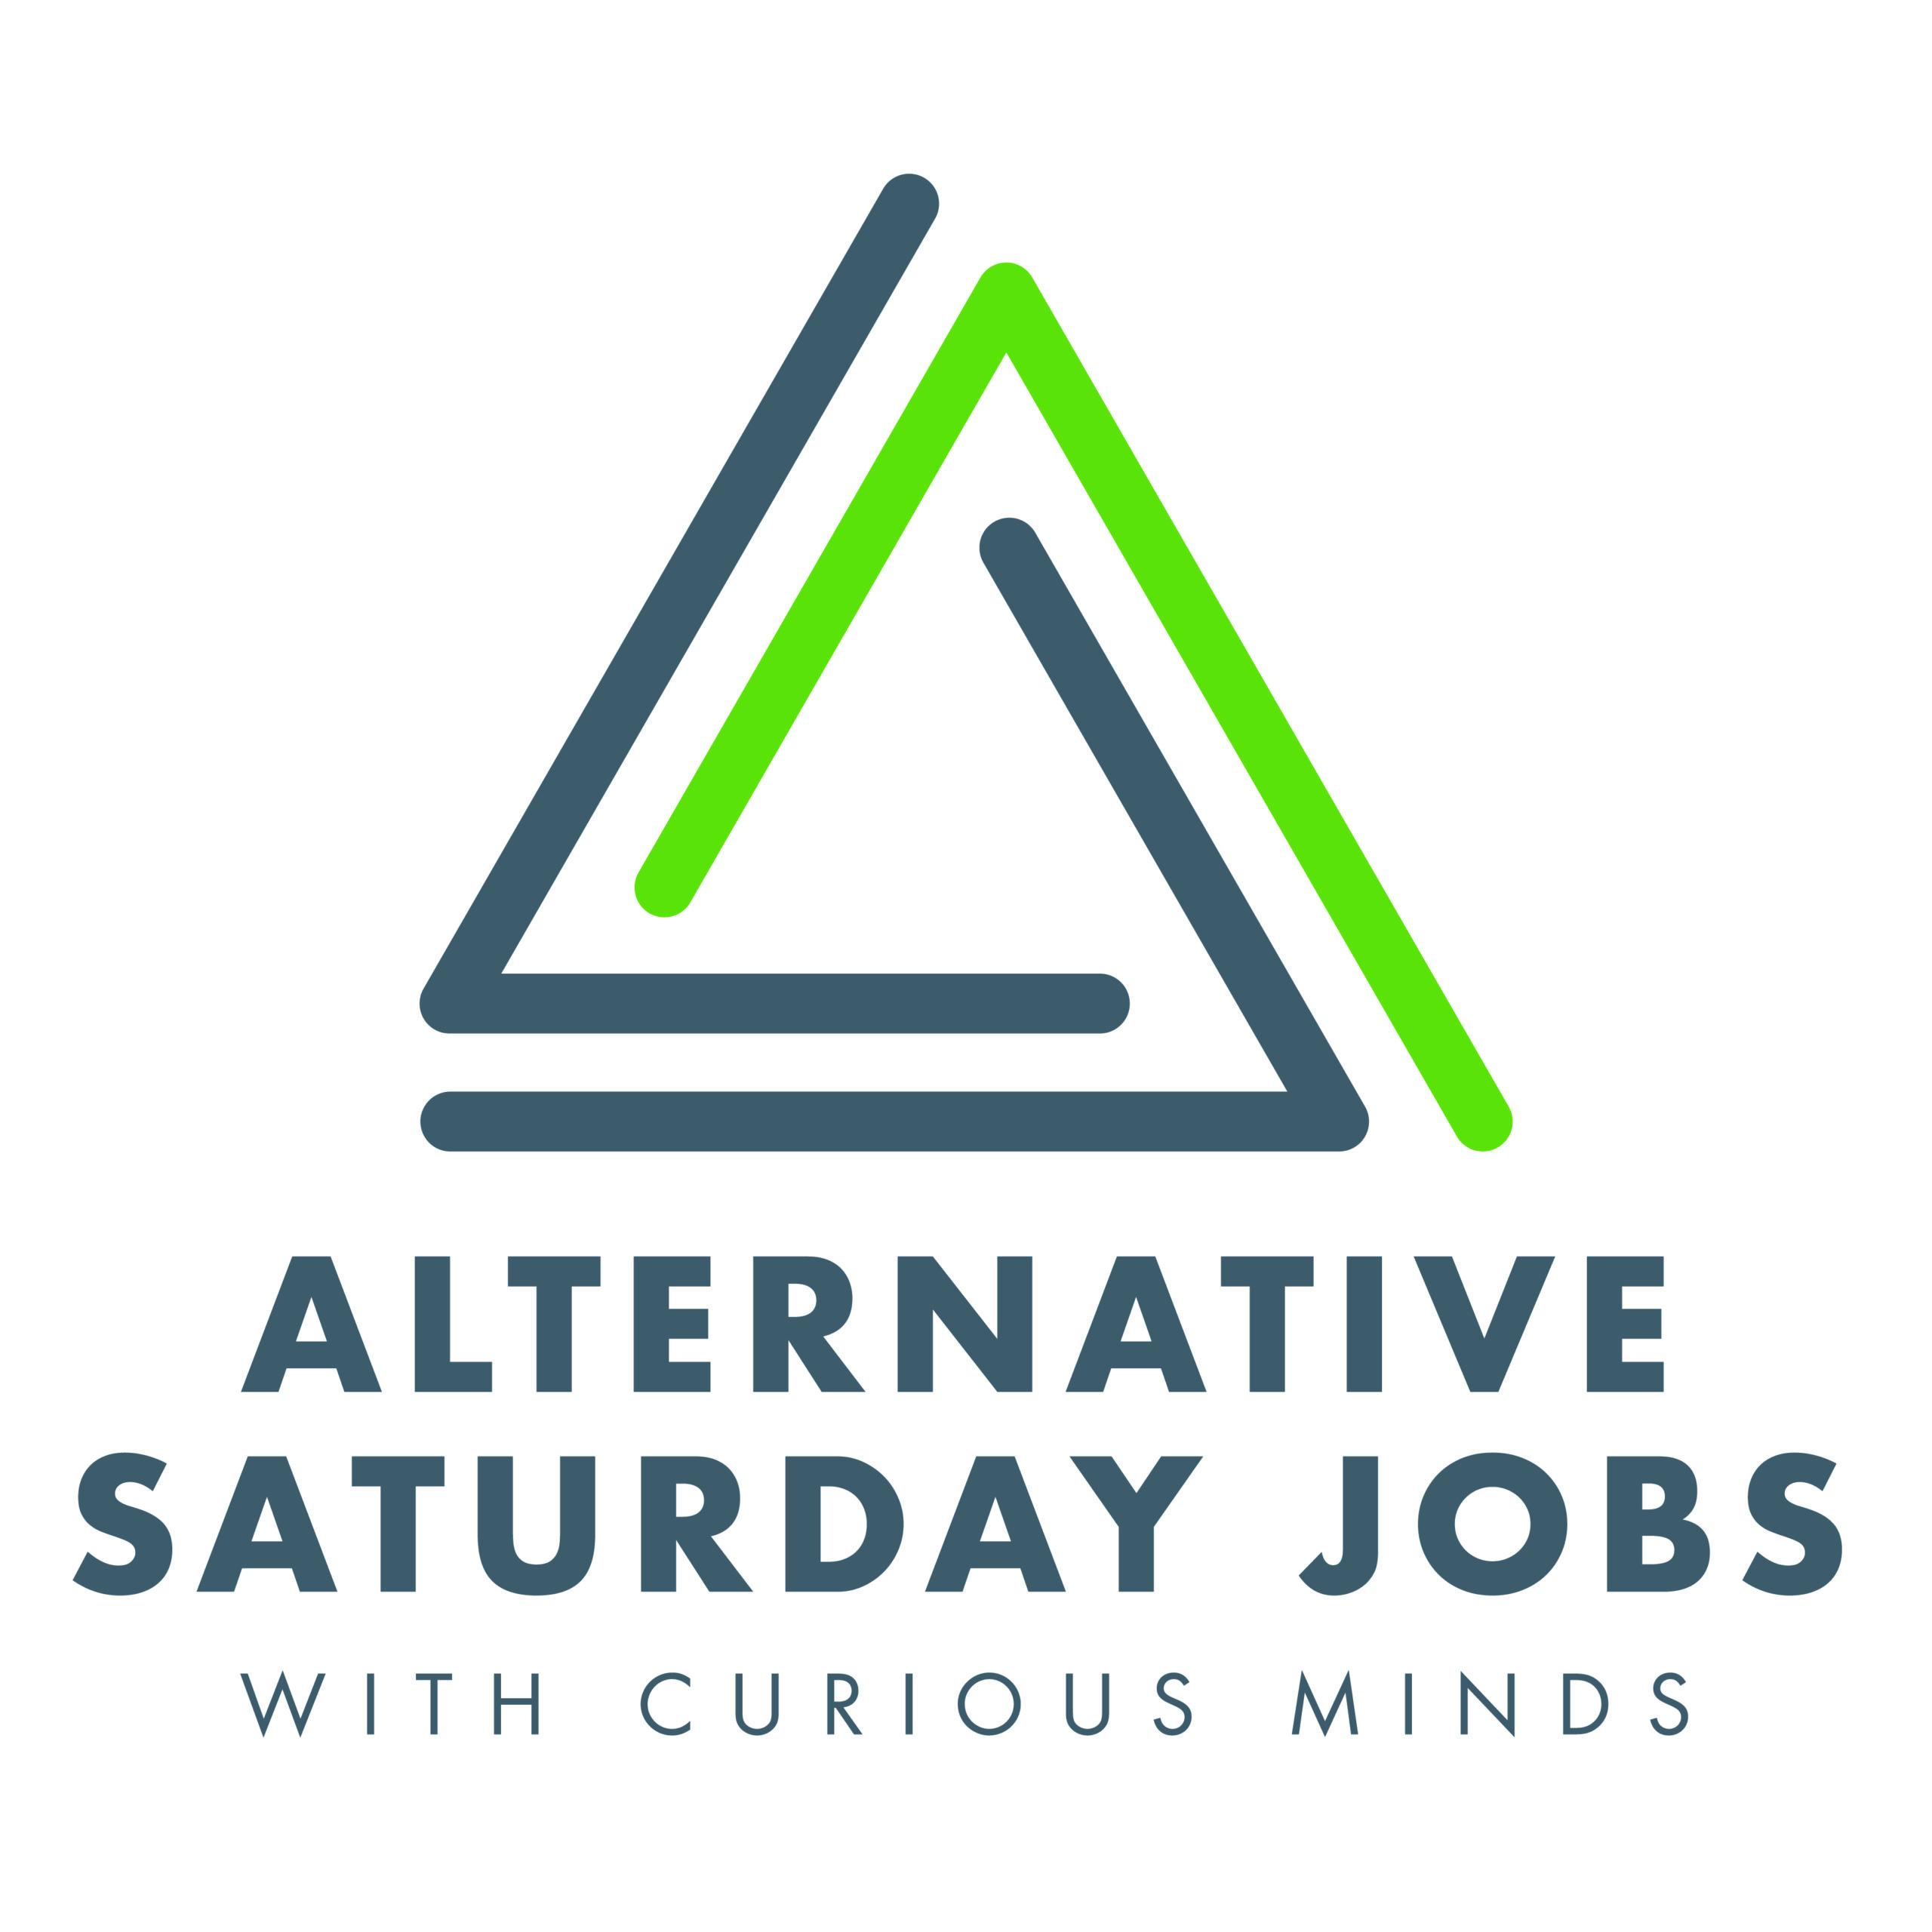 The Atkinson Alternative Saturday Job